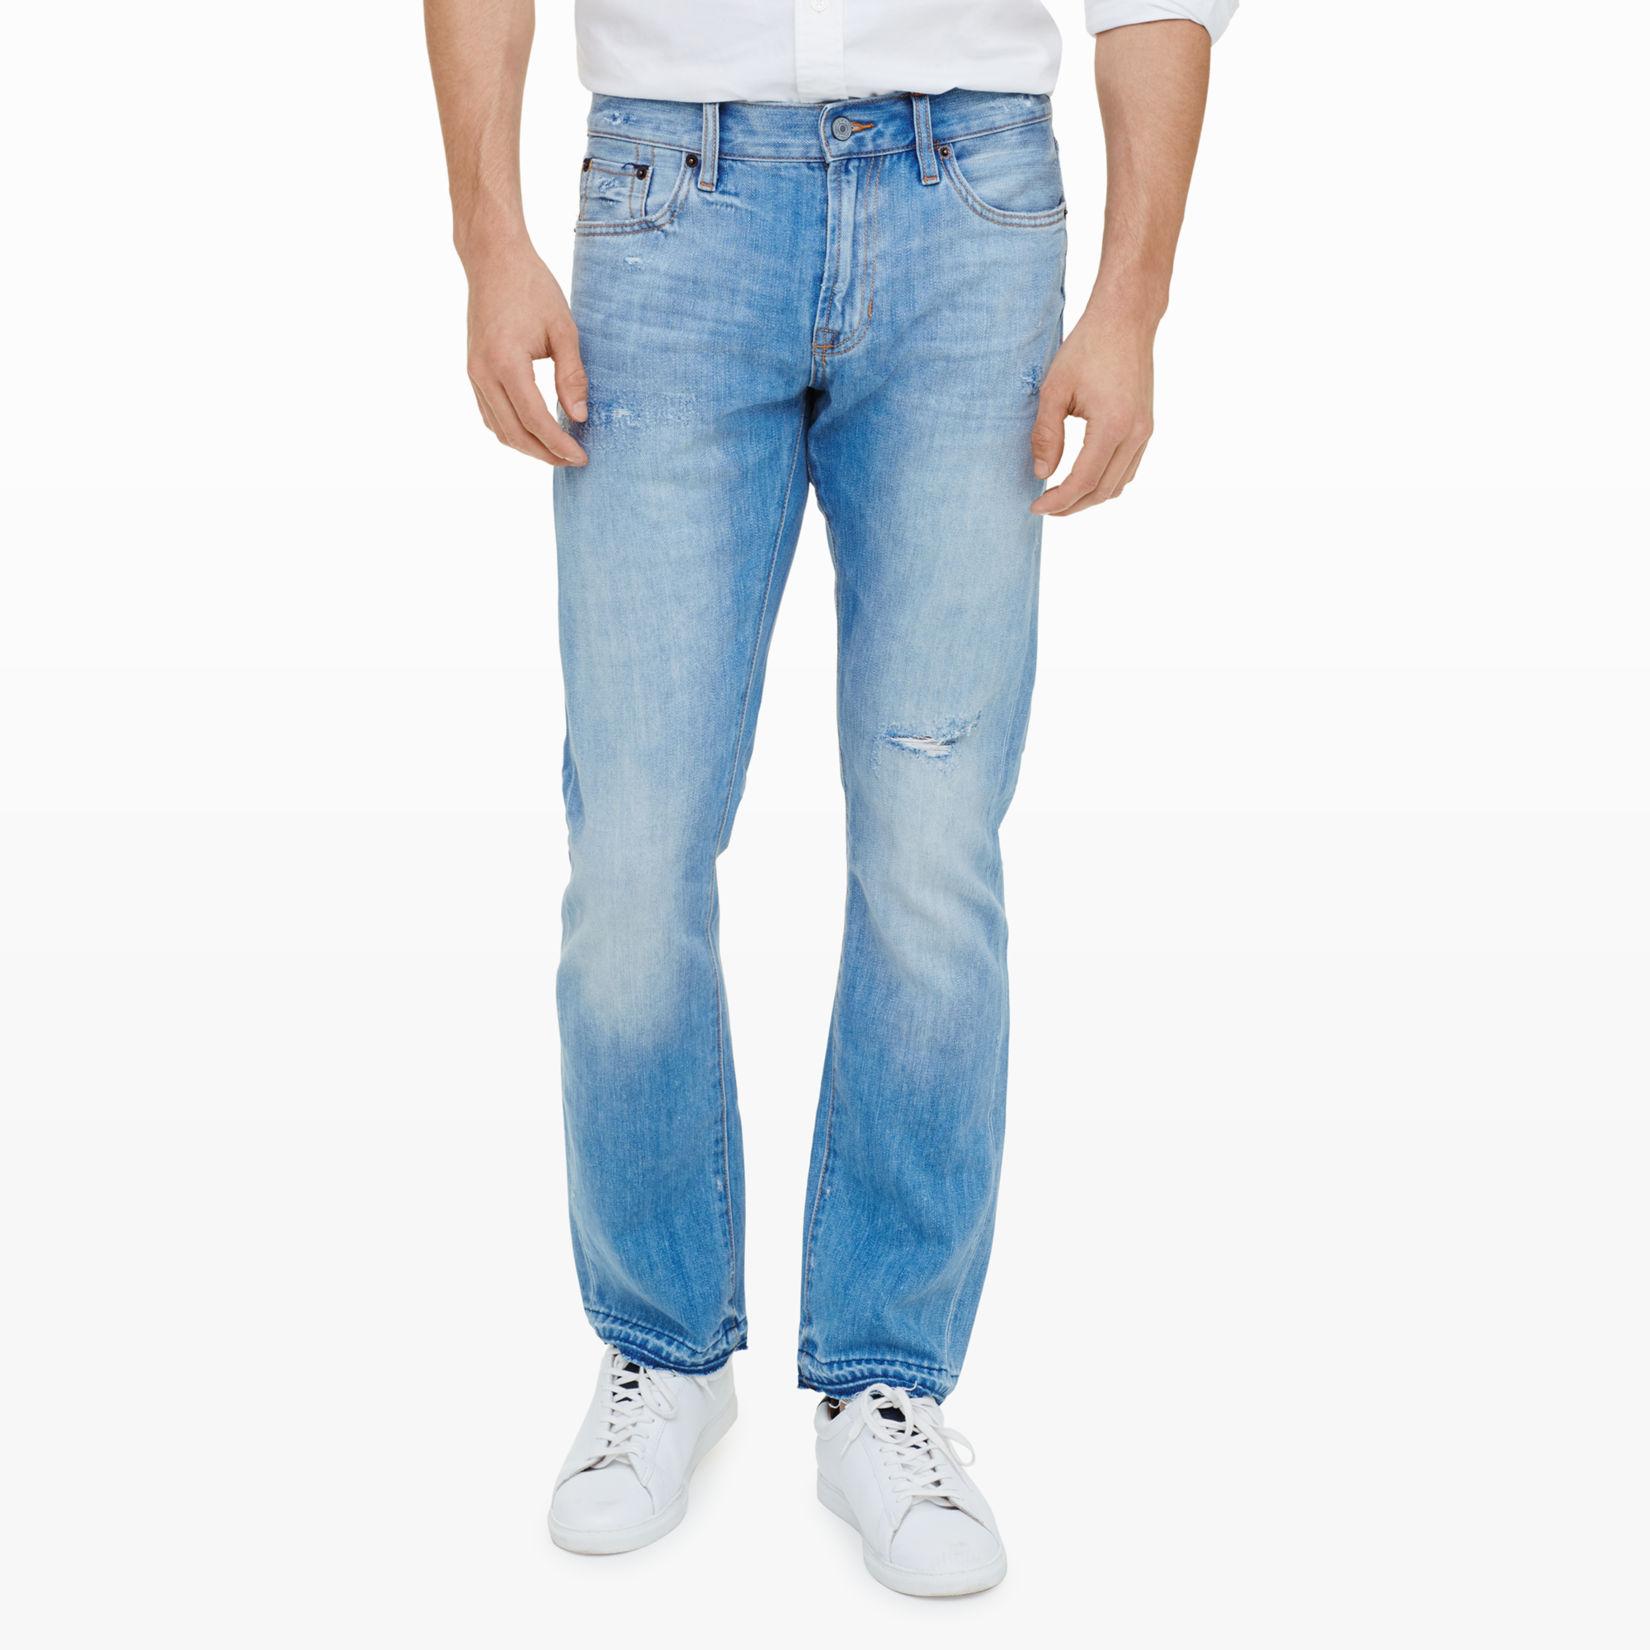 Men | Jeans | Jean Shop Mick NYC Vintage | Club Monaco